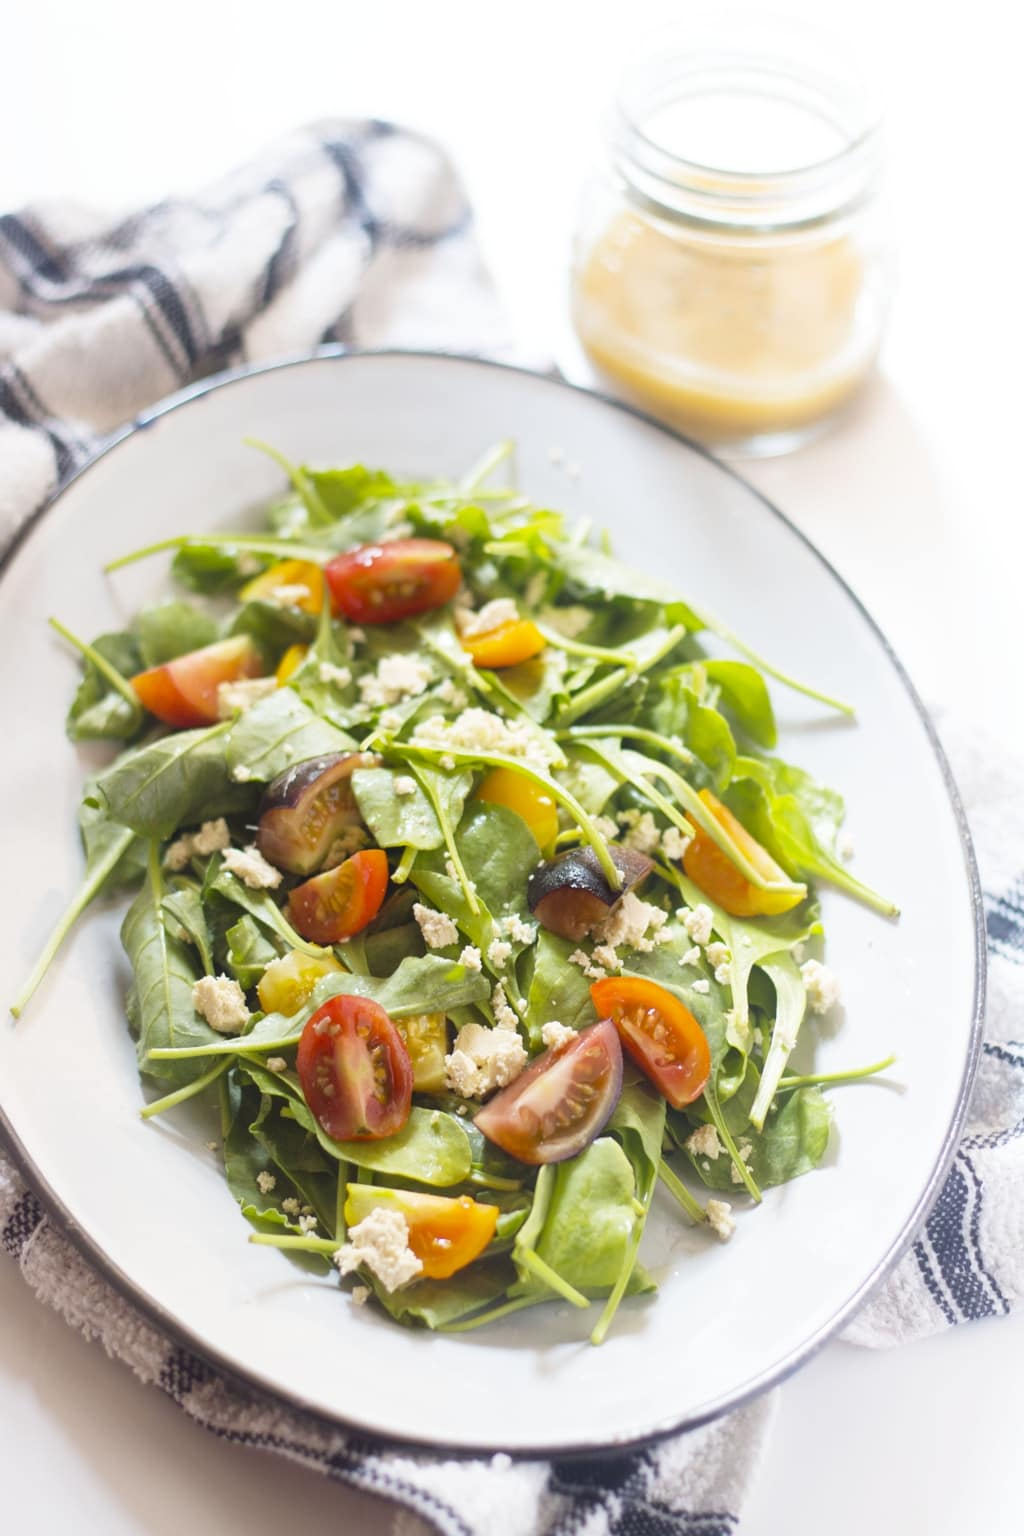 Spinach & Tofu Salad